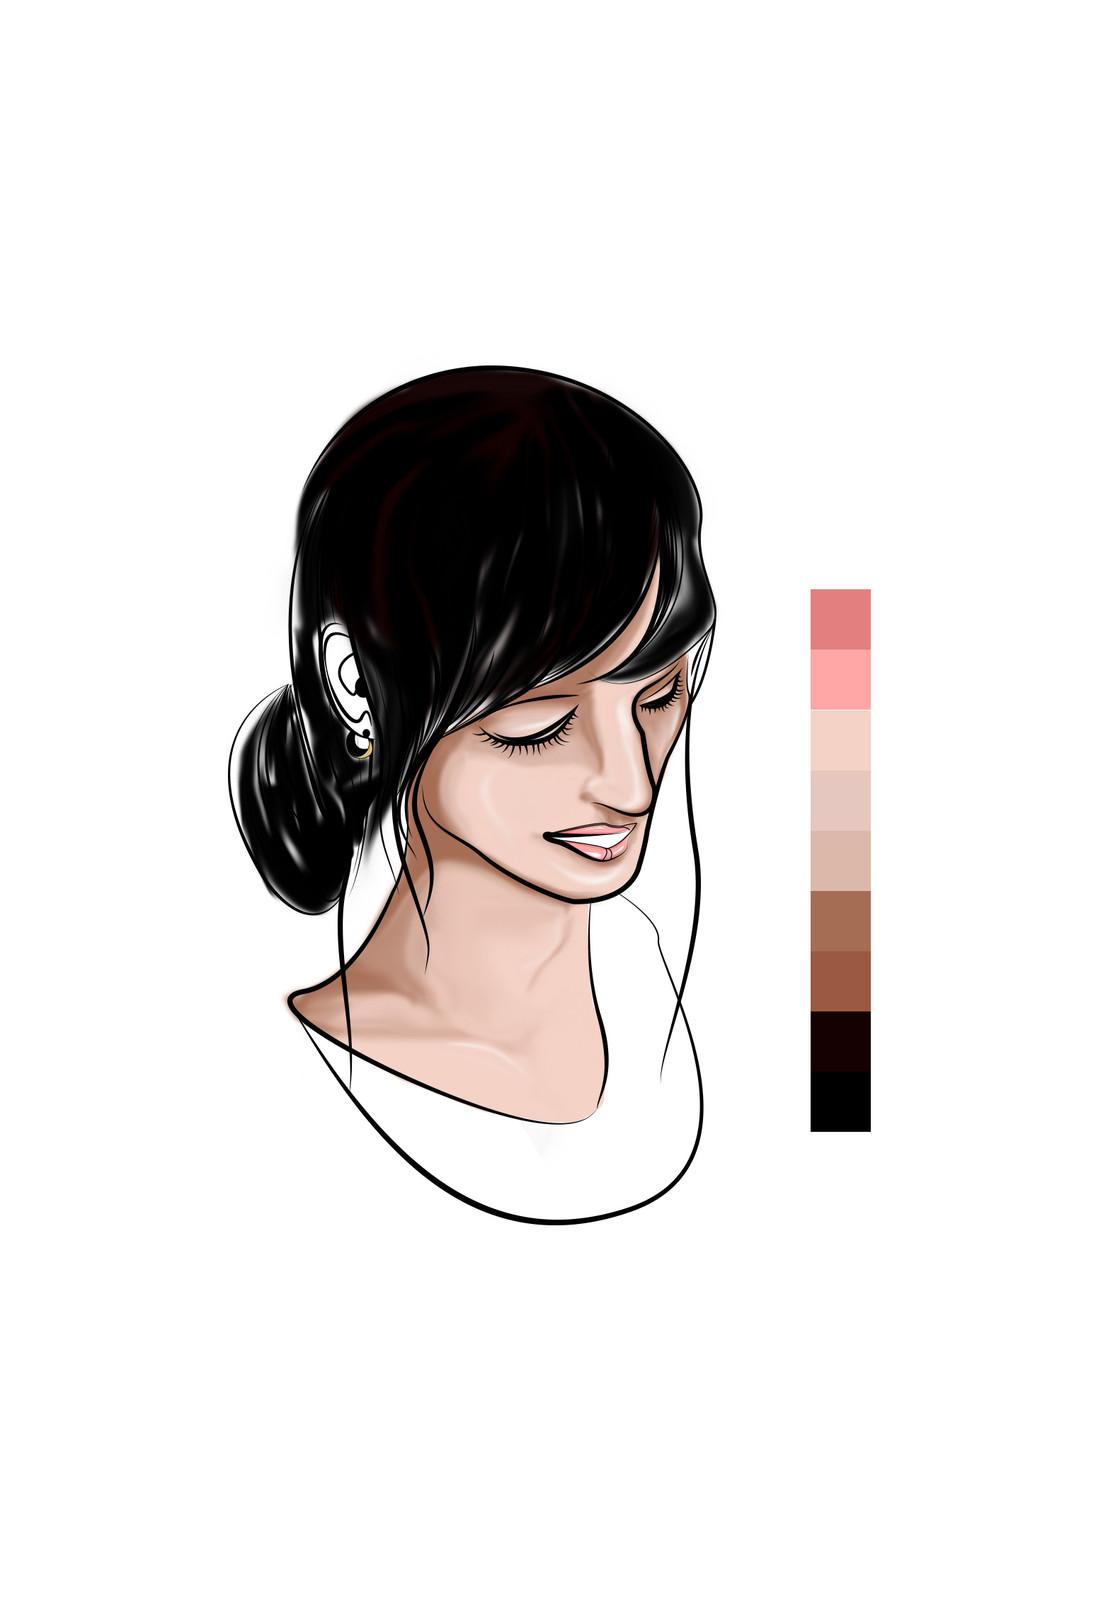 nine - Base coloring more detail (Hair)